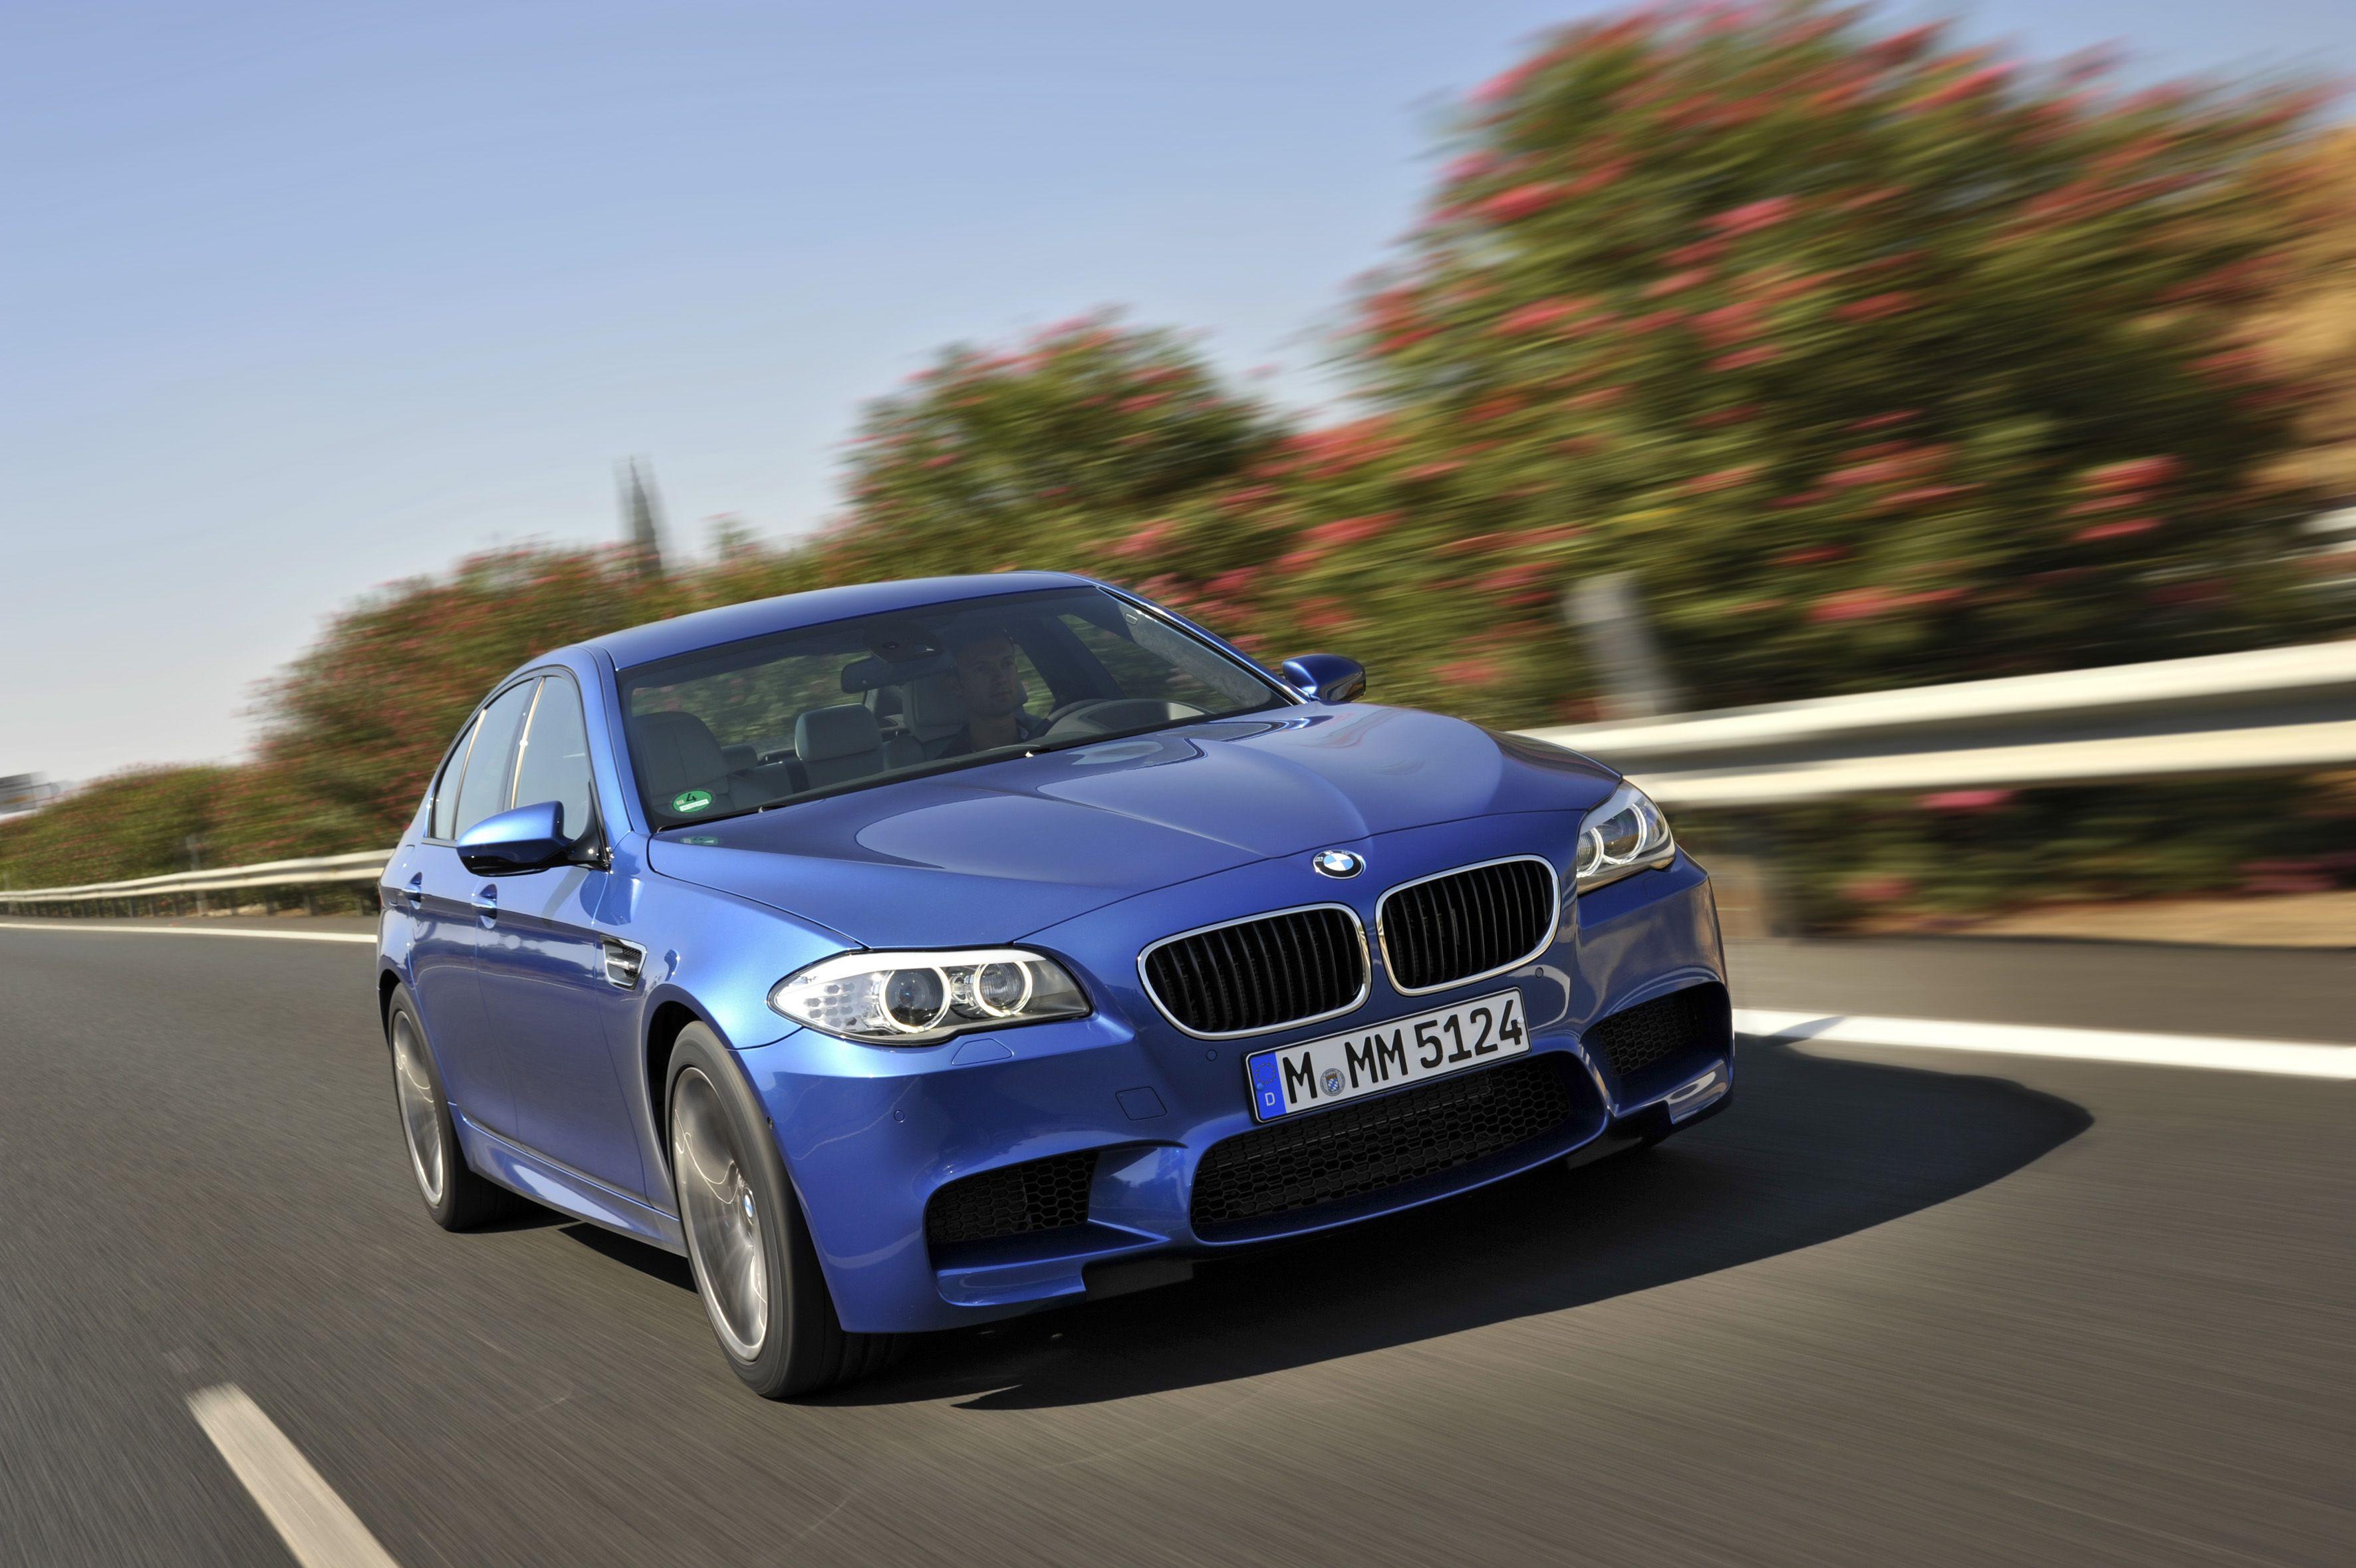 BMW F10 M5 Sedan MPerformance xDrive